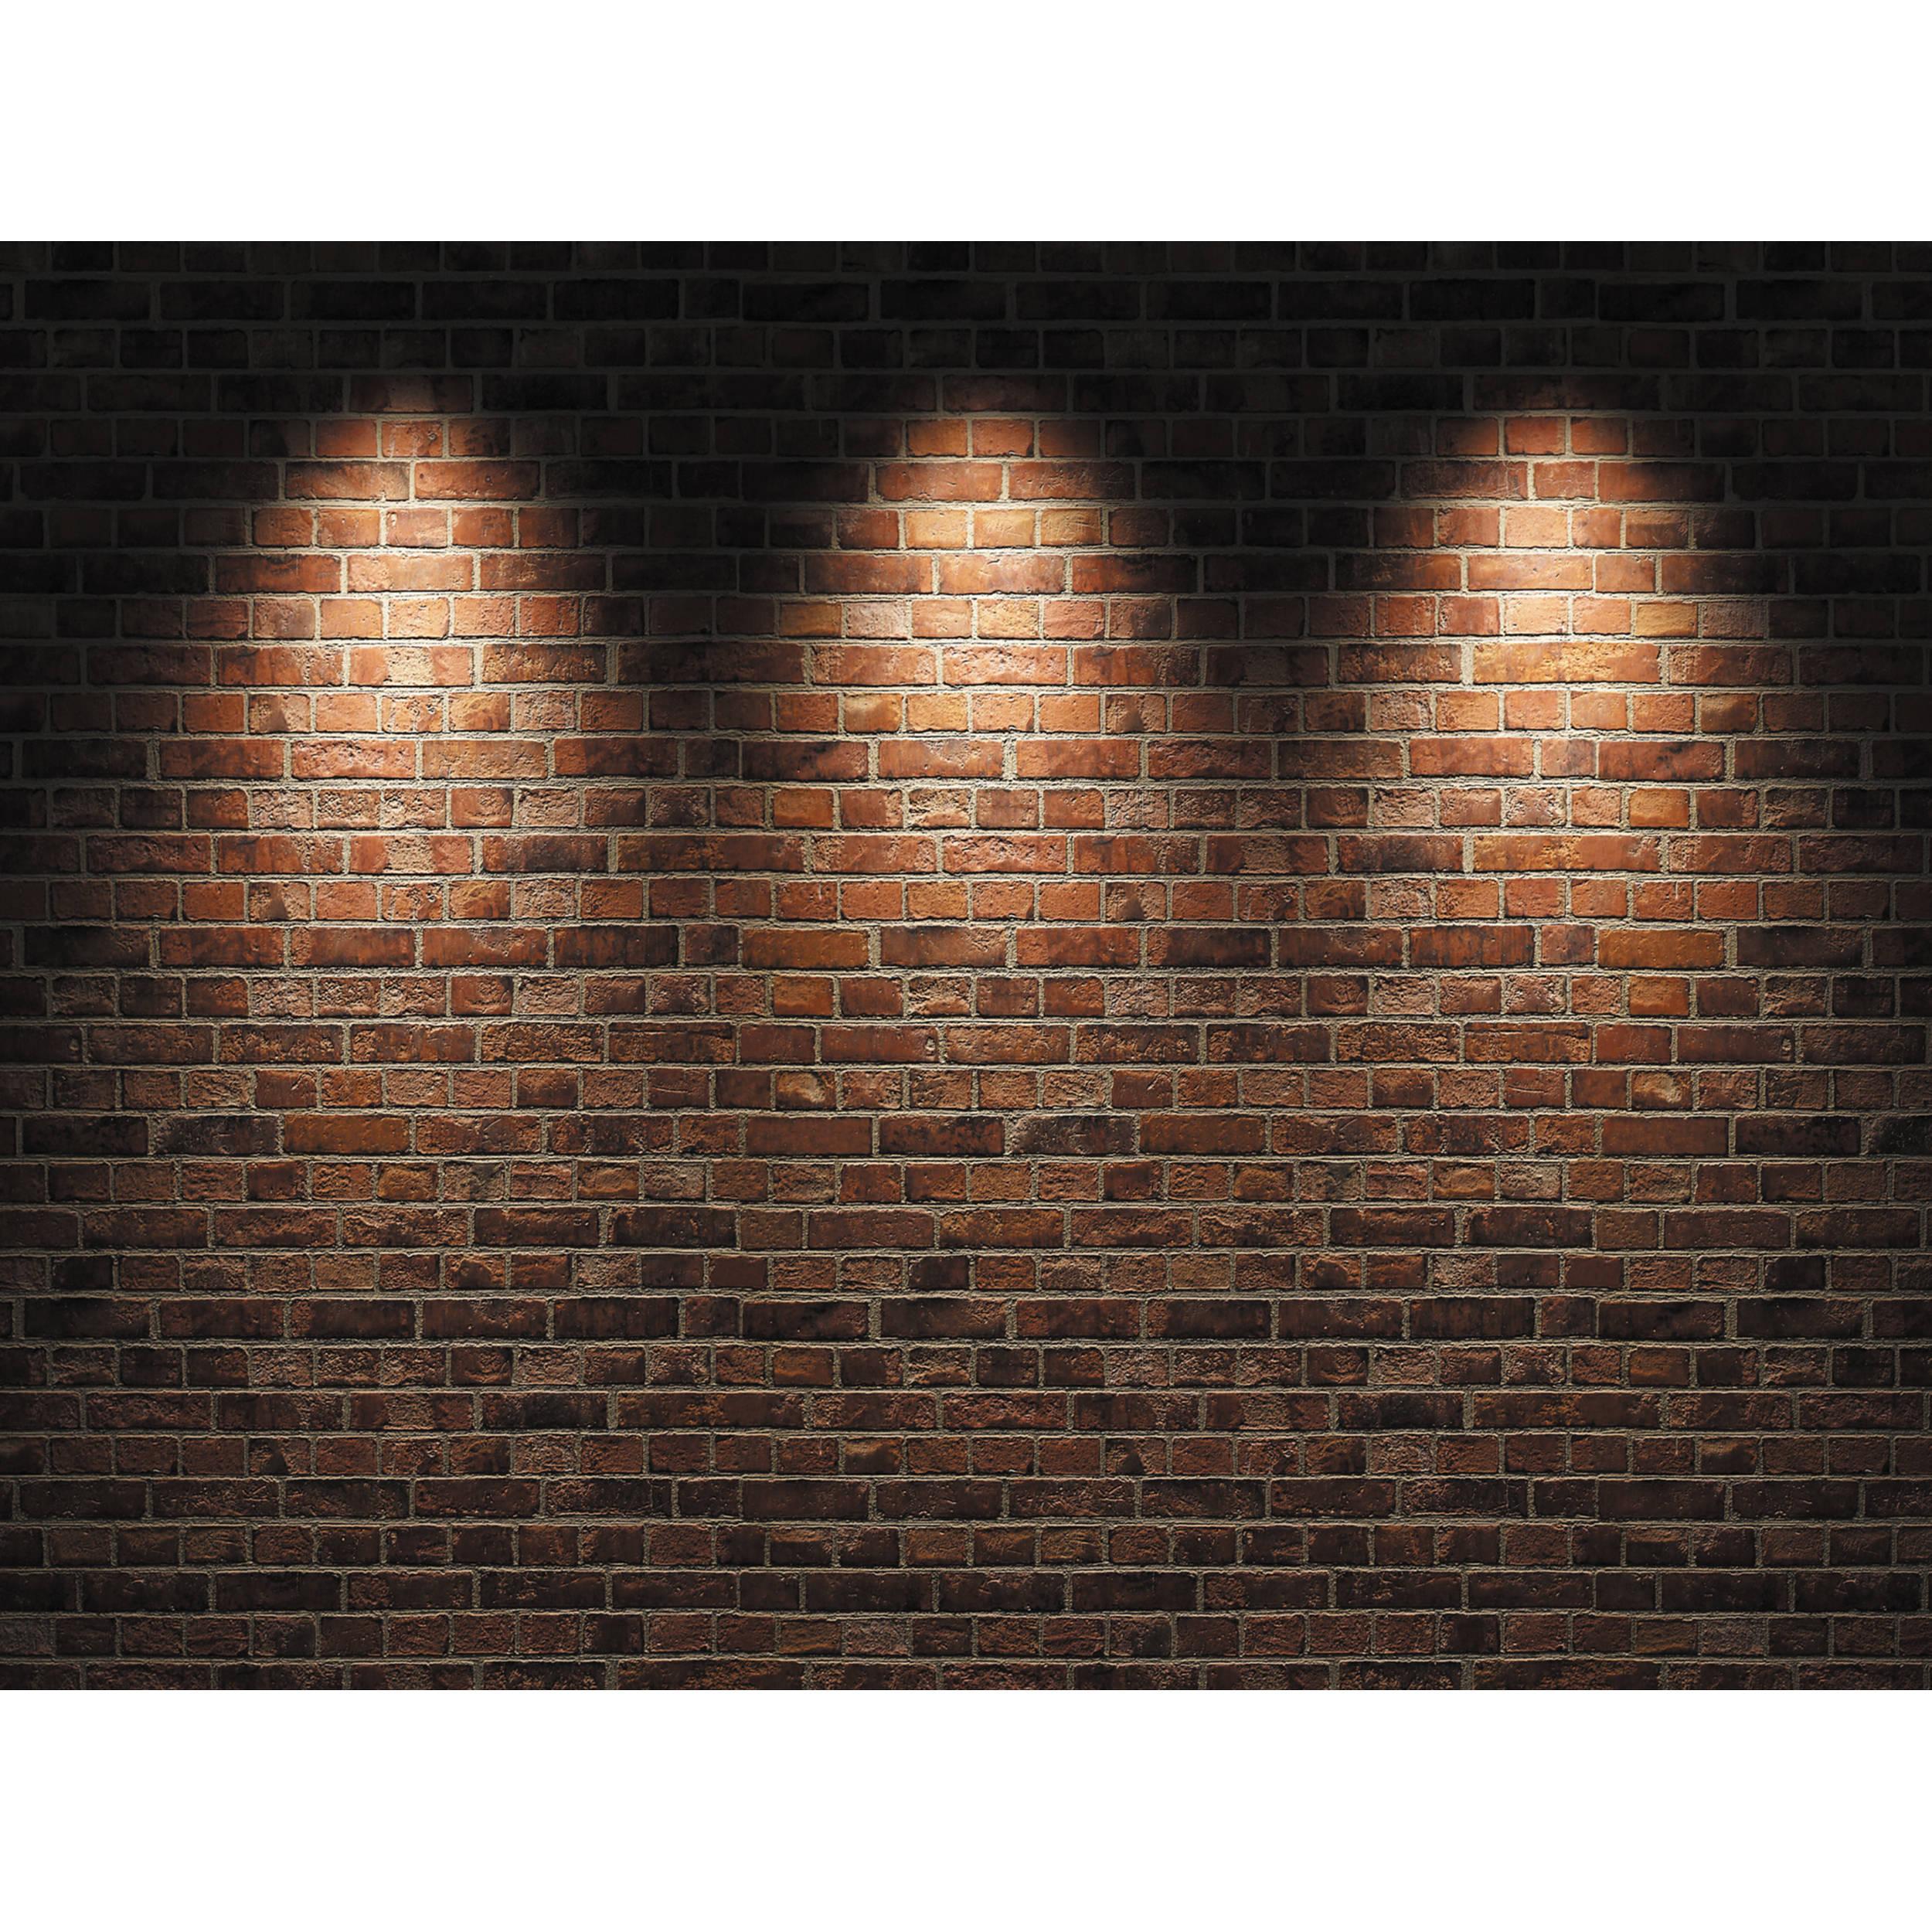 Westcott Quot Brick Lights Quot Scenic Background 6 X 8 964